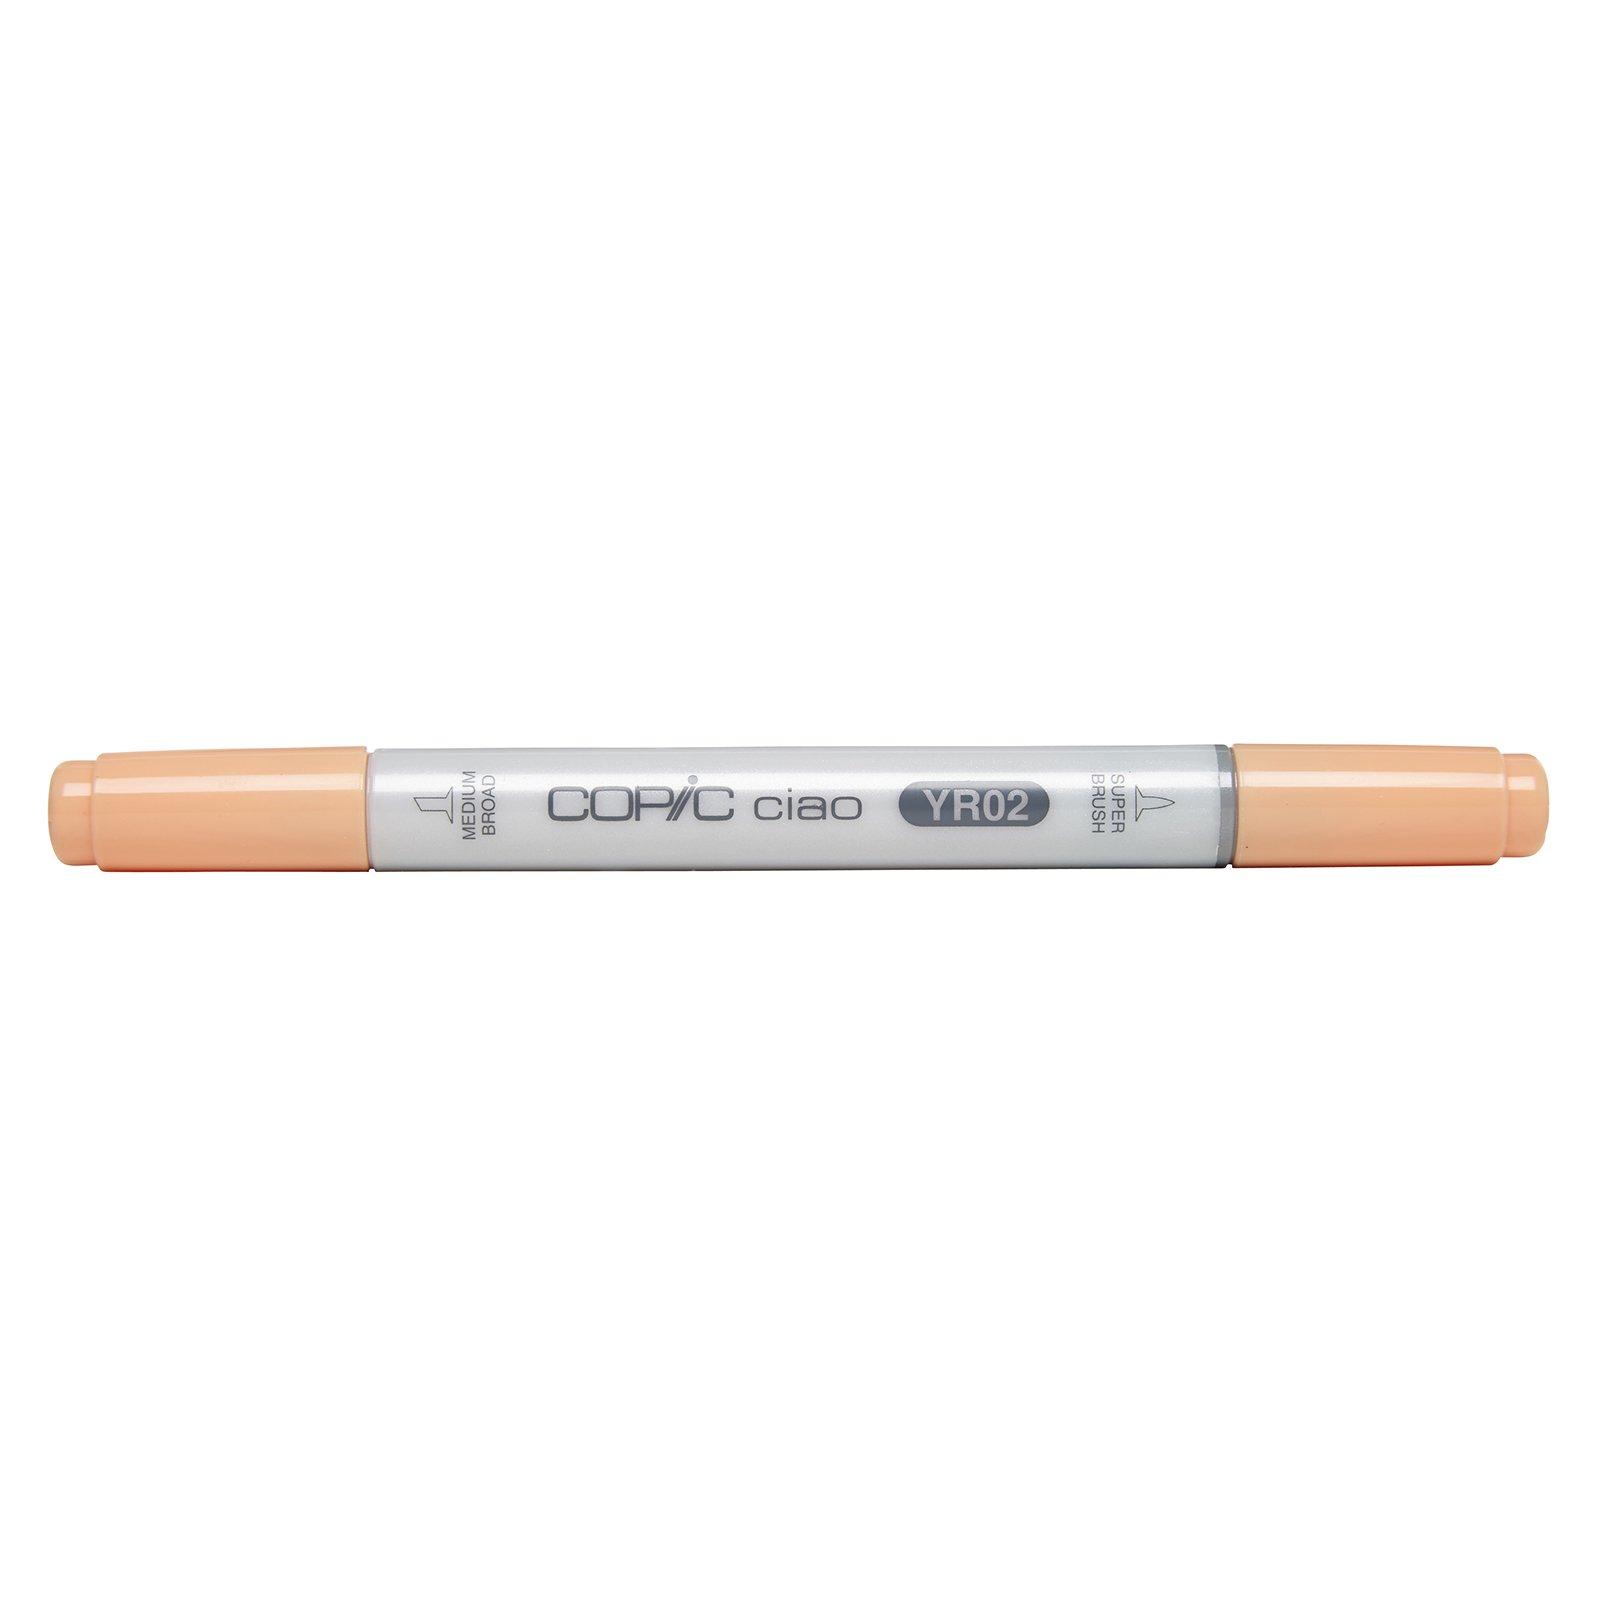 Copic Ciao Markers, Light Orange